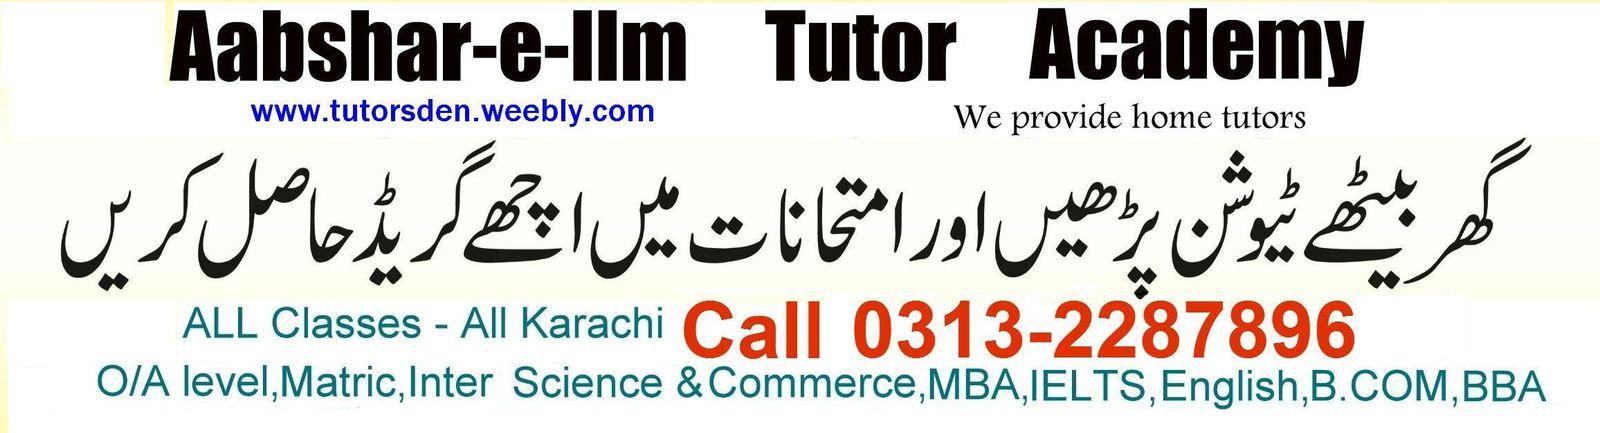 Science tutor Karachi, weak students, house wives, language tutor , commerce tutor karachi ,commerce tuition karachi, commerce teacher karachi, home O-level tutor karachi, O-level tuition karachi, O-level teacher karachi,home A-level tutor karachi, A-level teacher karachi,A-level tuition Karachi, home maths tutor karachi,maths teacher karachi,maths tuition, accounting tutor karachi, accouts teacher karachi, accouting tuition karachi,home Biology tutor karachi, Biology teacher karachi, biology tuition karachi, home Chemistry tutor karachi, chemistry teacher karachi, chemsitry tuition karachi, home stats tutor karachi, statistics tuition karachi, stats teacher karachi, home School tutor karachi,Home tutor in defence, Private tutoring academy, private teacher provider, online tuition, online tutoring, online classes, study online home tuition , online assignments, online teachers, online teaching, home teaching, tutoring jobs, online teaching , karachi tutors, pakistani online tutors, tariq road tutors, clifton tutors,English tutoring, Beaconhouse Tutors, PAF school teacher, Jobs for teaching, Online jobs, Jobs in karachi, Tuition in karachi, Part time jobs, Home tuition center, Tutoring academy, home tutors, finance tutor,accounts tutor in karachi, home tutoring agency, private tutor academy, tutor, teacher, academy,karachi,pakistani tutor, pakistan, education, malala fund, educate yourself, taleem, home tutor, private tutors, personal trainer, music learning, learn online,home tuition center, stats tutor, bcom tutor, home tutor for bcom, accounting tutoring, accounts teacher, financial accounting, management tutor, business math, mathematics tutor, math teacher, math tuition, home tutoring, math tutoring, professional math , admath tutor, olevel math tutor, olevel math, olevel chemistry, alevel tuition, a-level tuition, a-level tutor in karachi, o-level tutor, o-level commerce, olevel science, olevel tutor, olevel tuition, olevel tuitions in karachi, gcse tutor, gcse